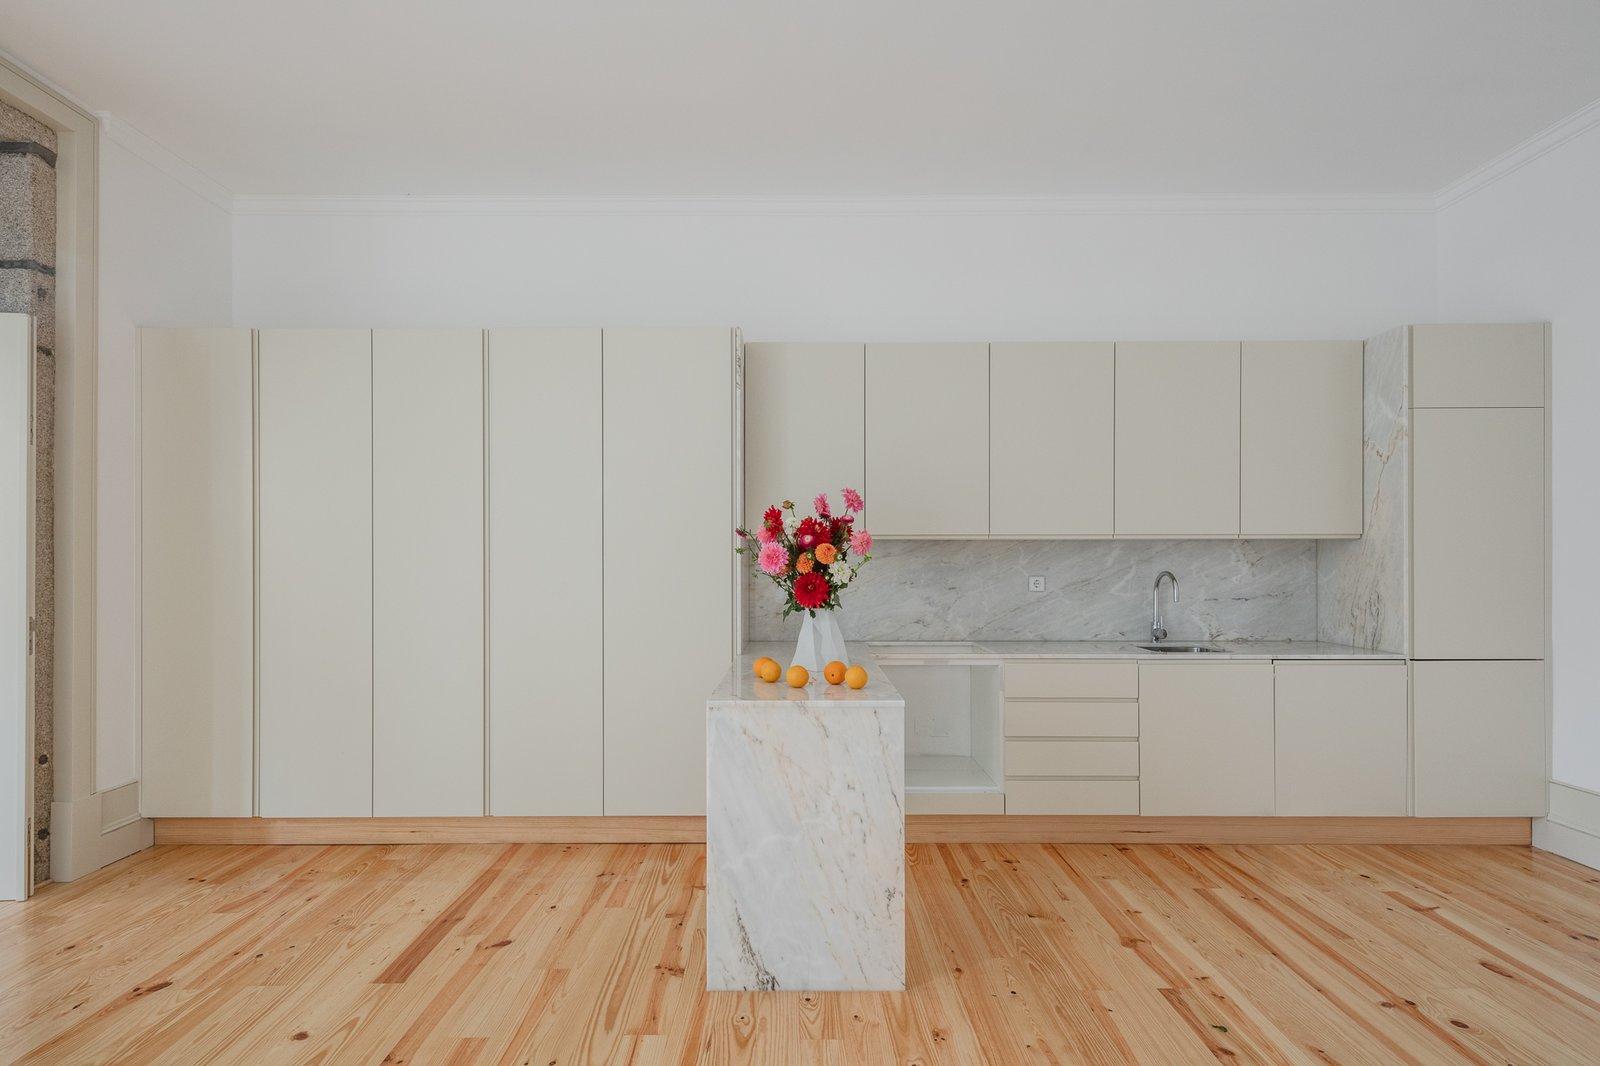 Kitchen, Marble Counter, White Cabinet, and Light Hardwood Floor  Best Photos from Rua da Boavista